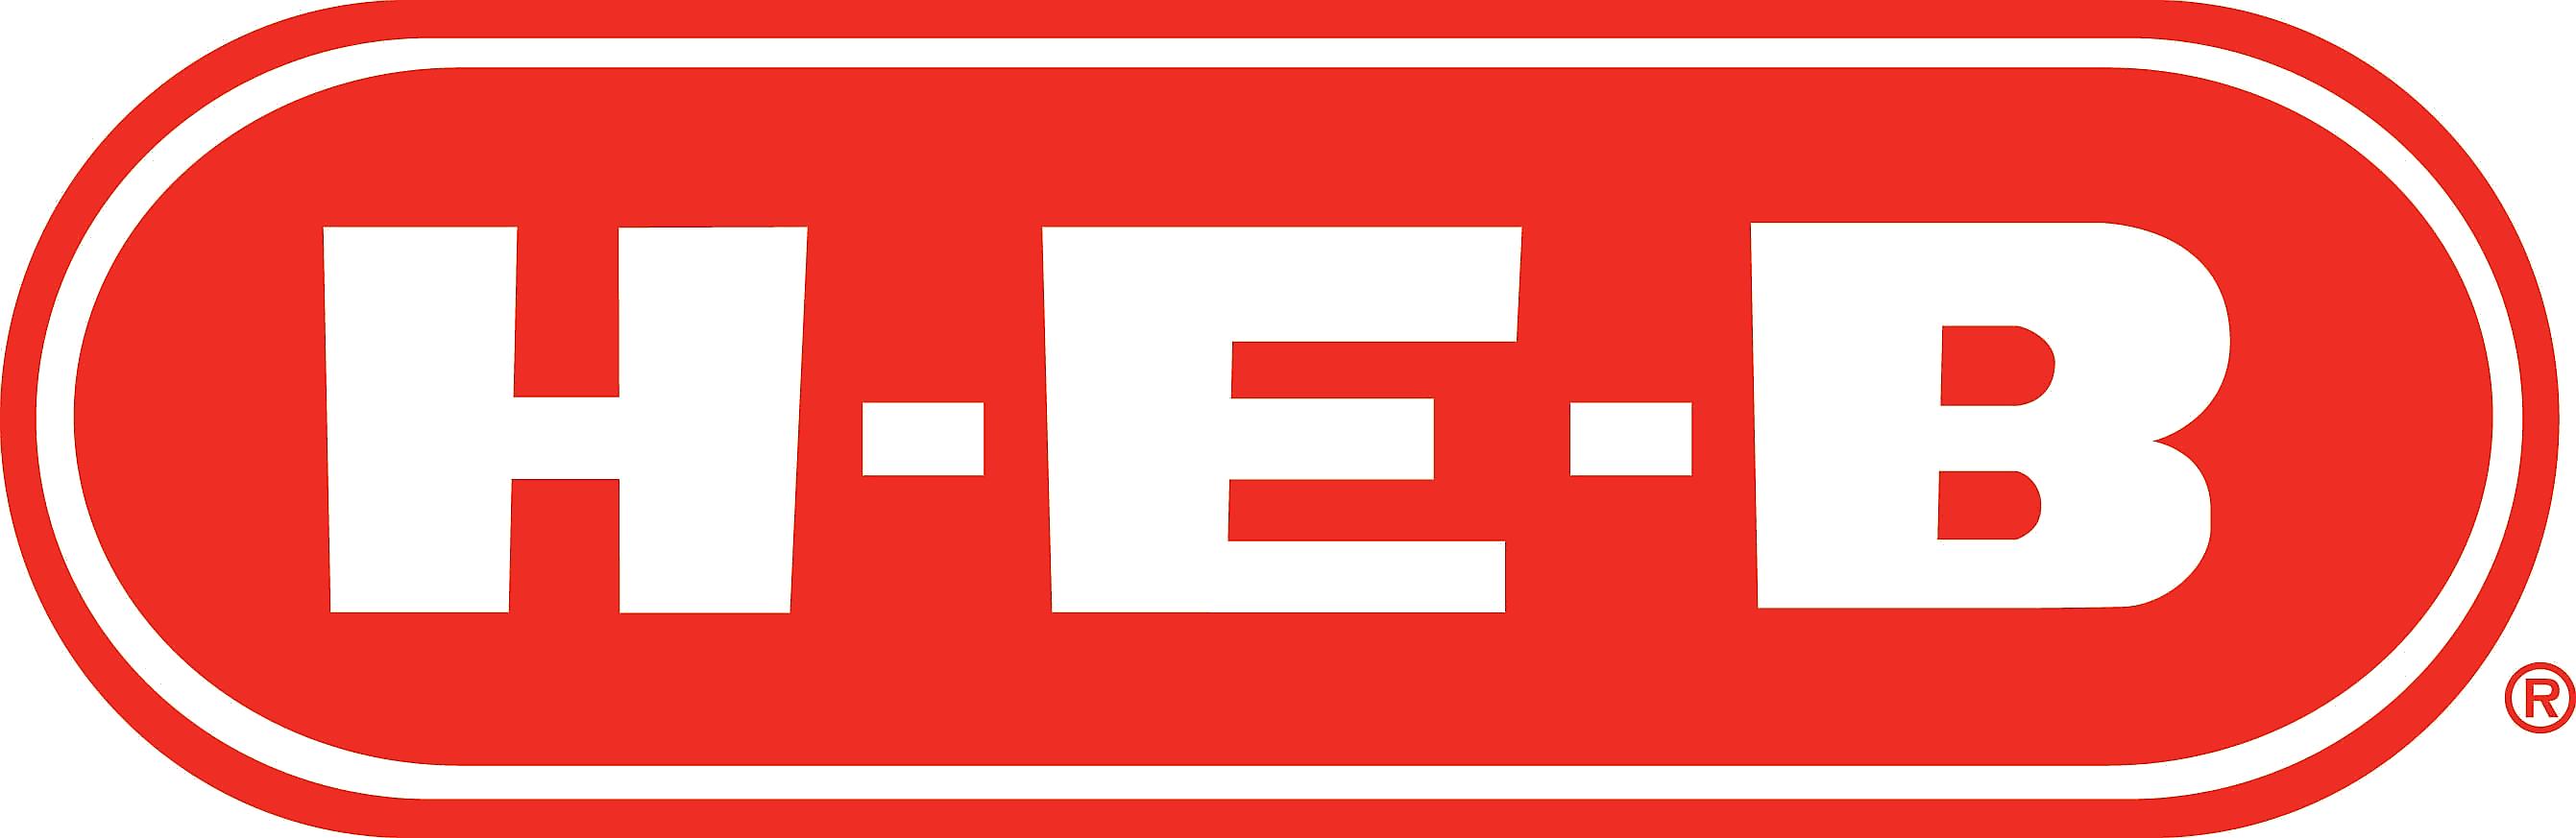 Large  www.heb.com